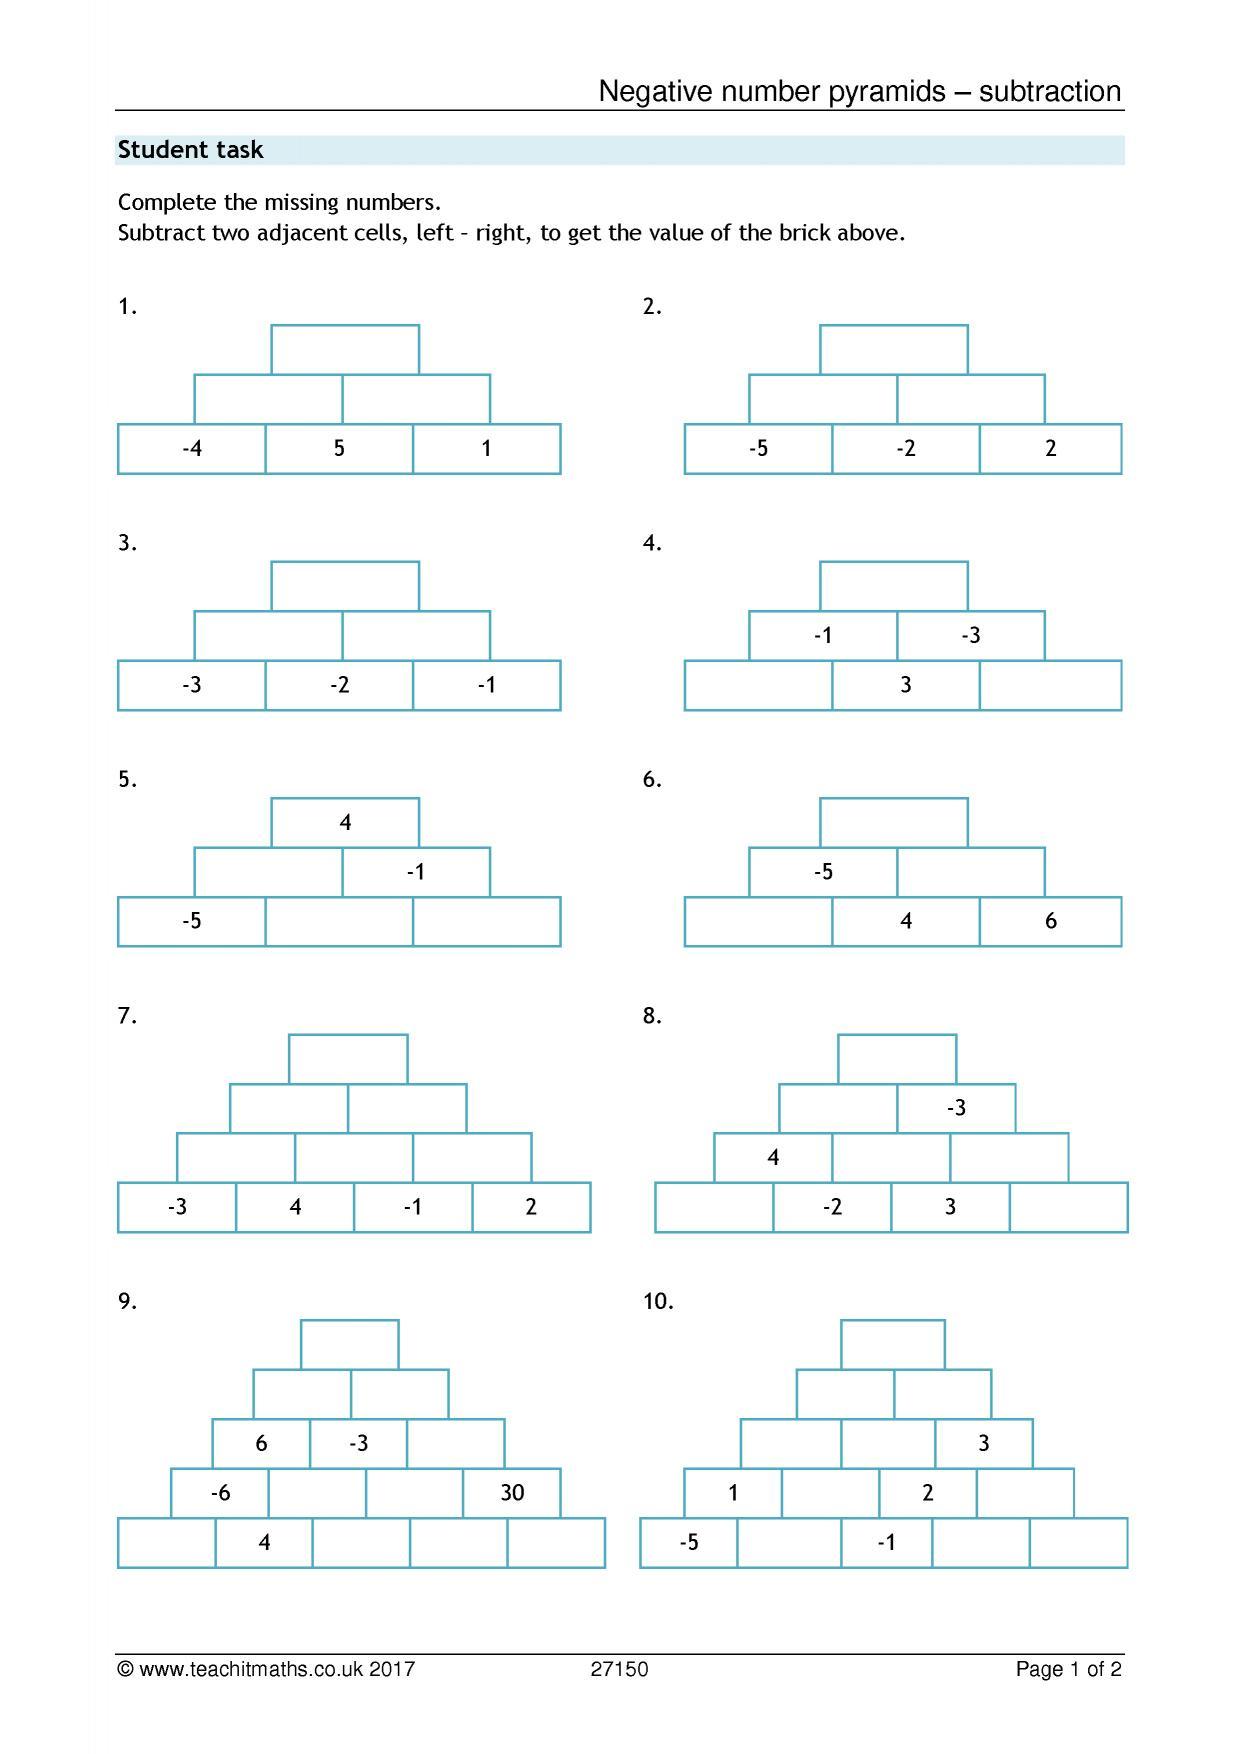 Negative Numbers Pyramids